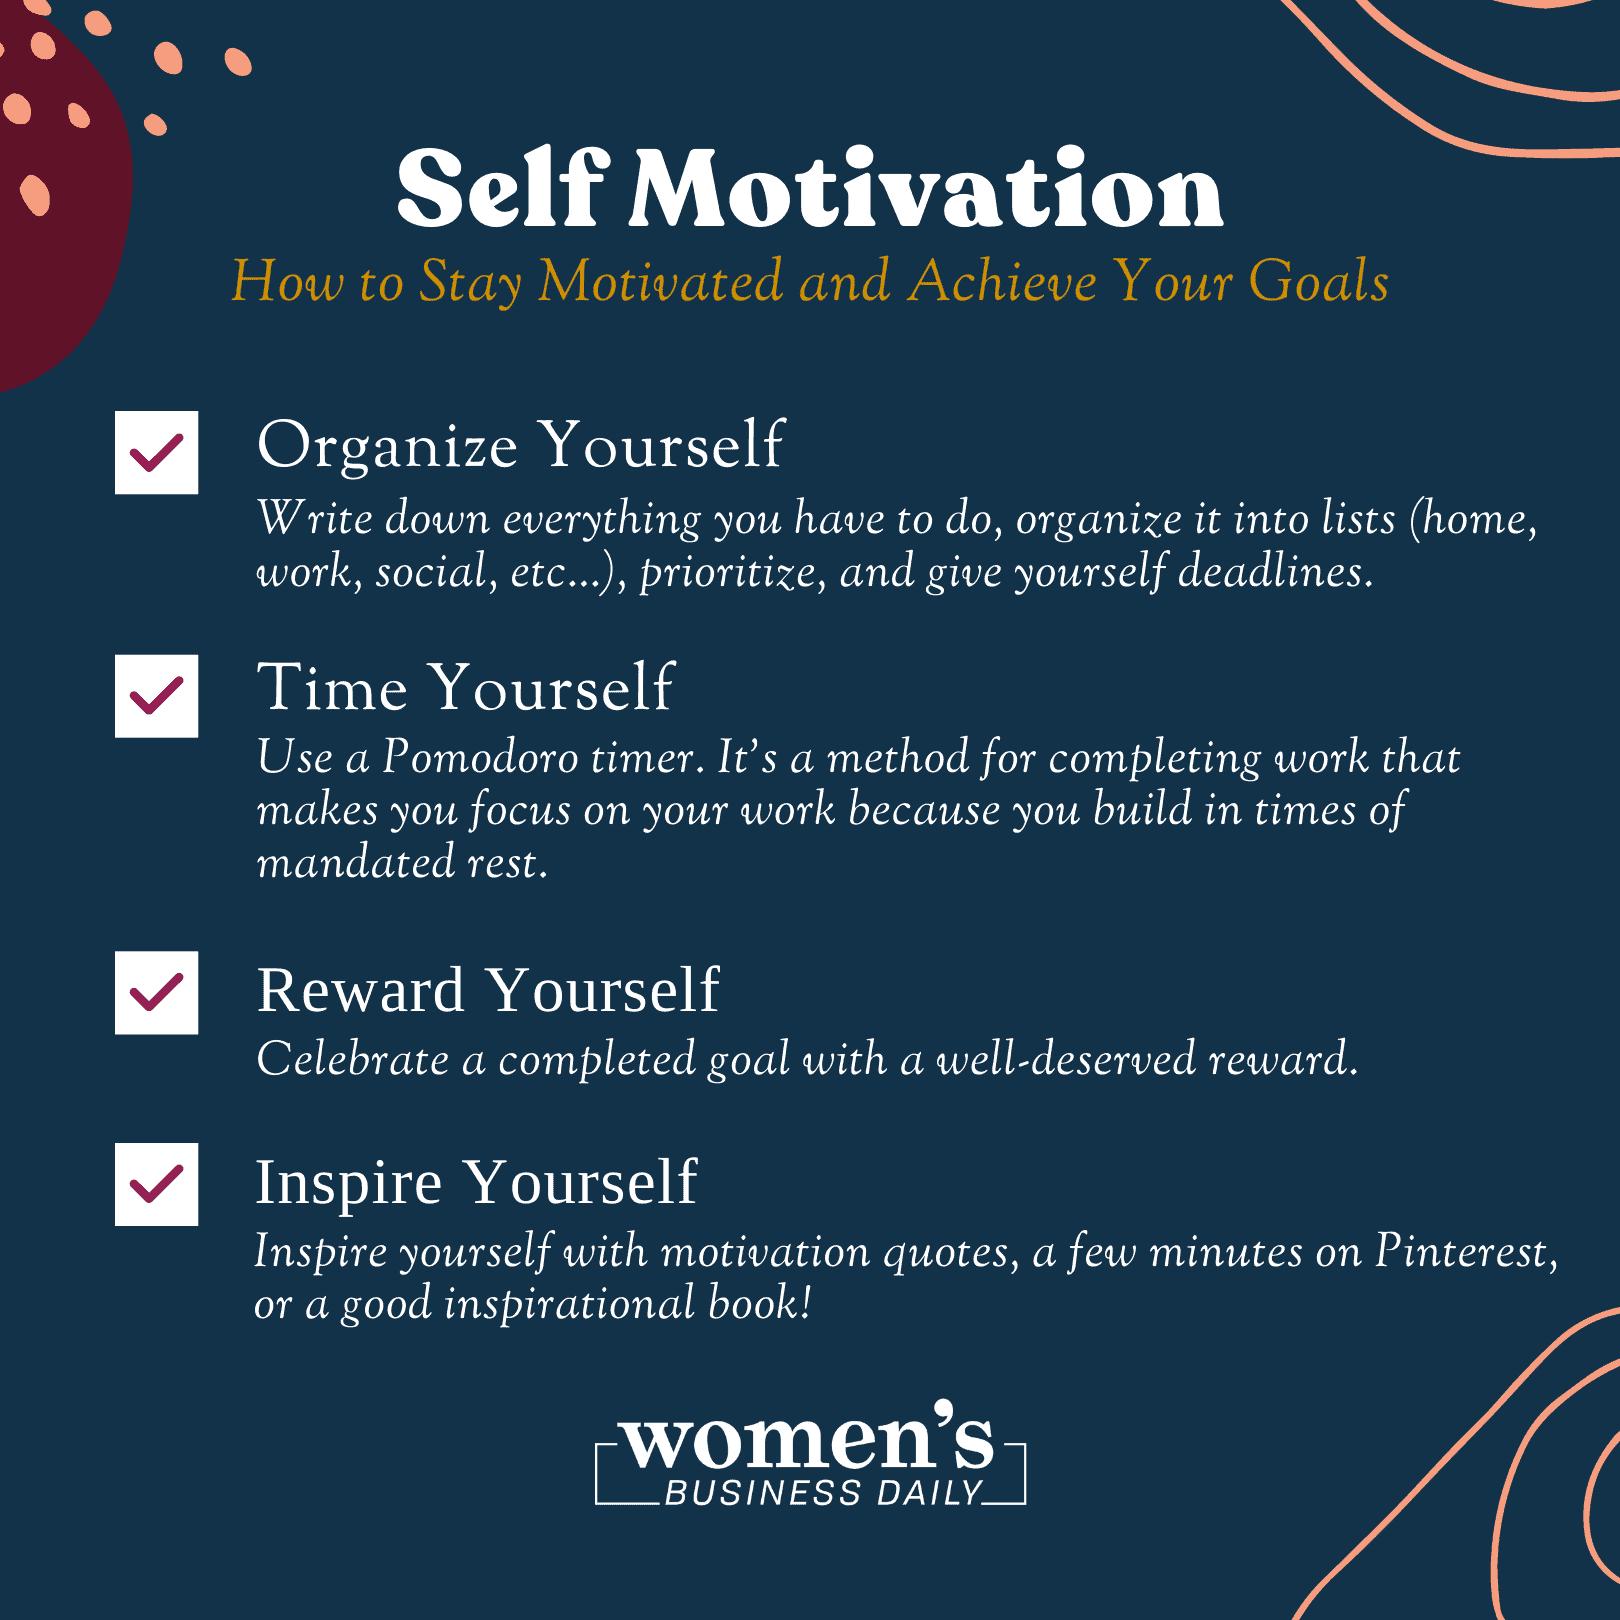 Self motivation checklist